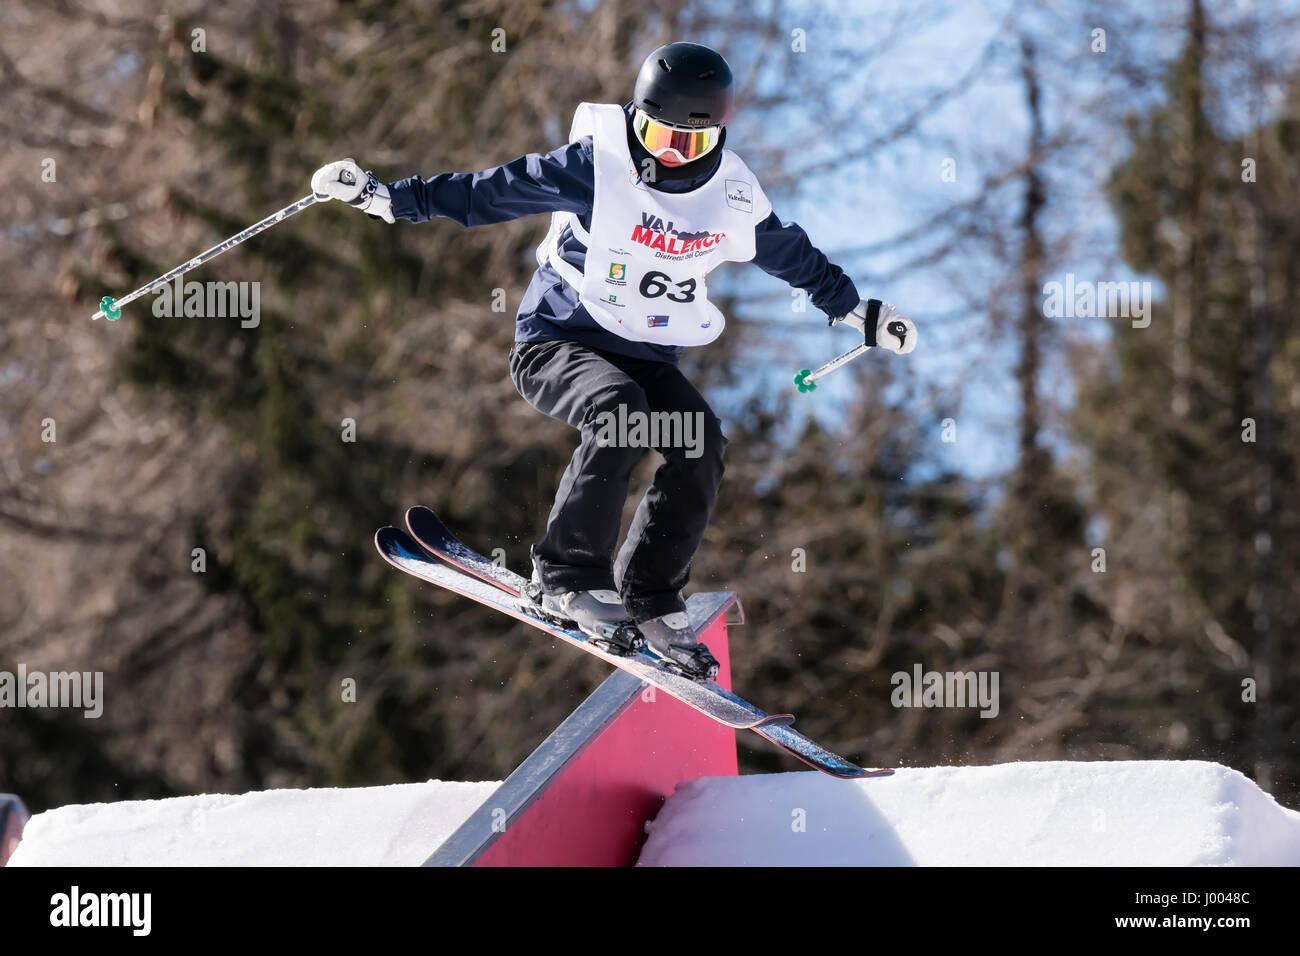 CHIESA VALMALENCO, ITALY - APRIL 6, 2017: Freestyle Ski FIS Junior World Chanpionship, athlete in slopestyle - Stock Image